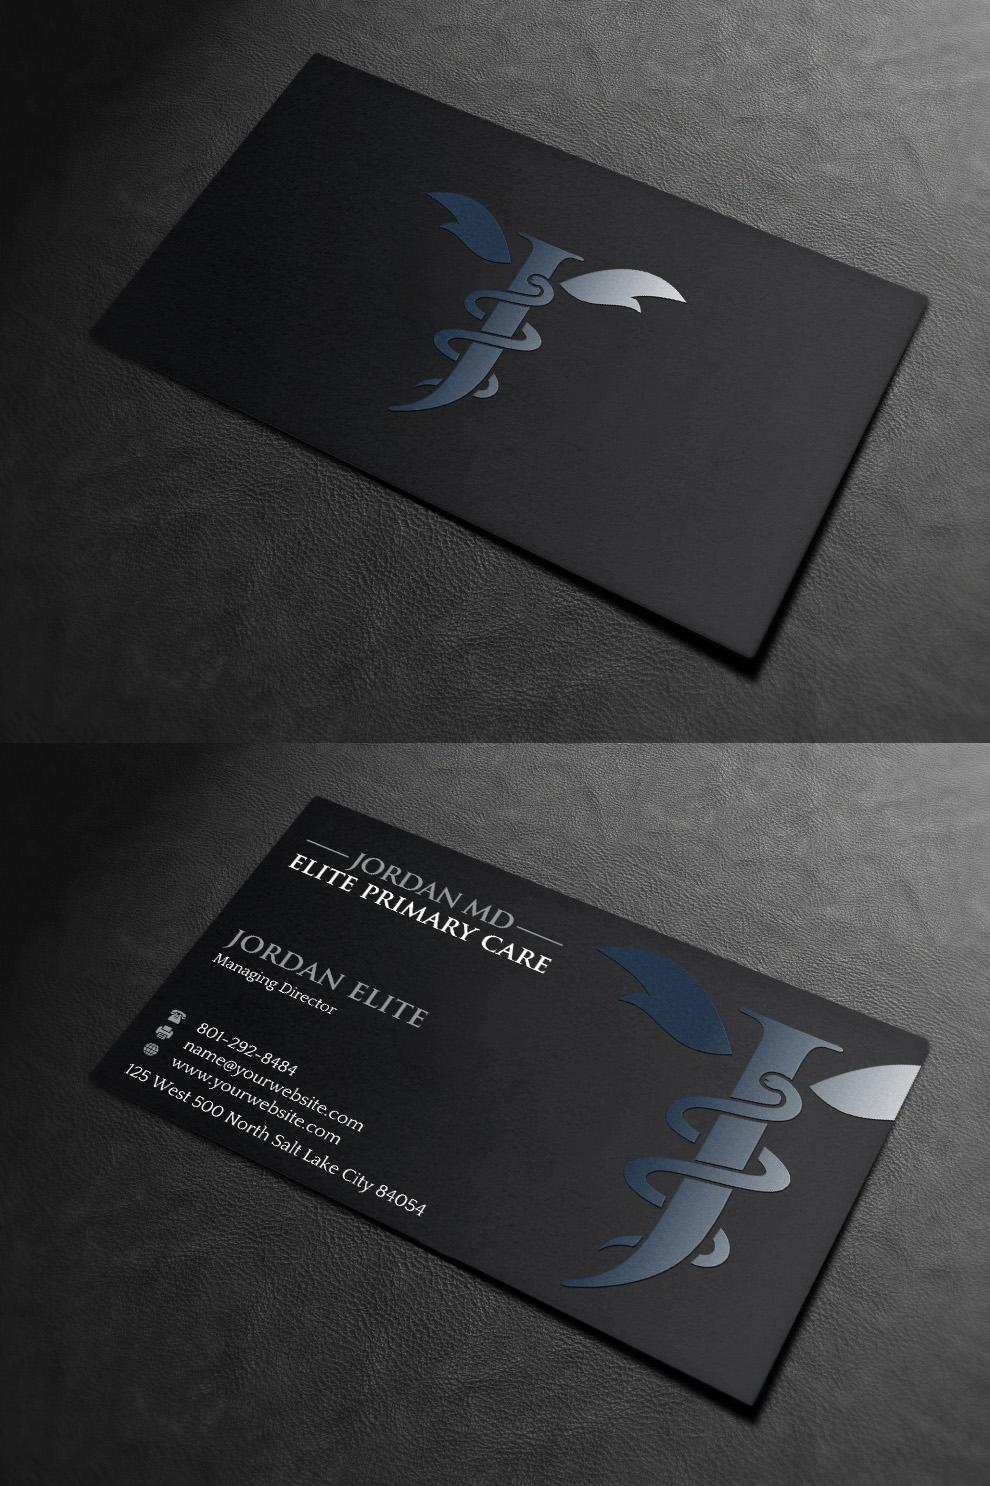 Serious professional medical business card design for jordan elite business card design by indianashok for jordan elite primary care design 17419173 colourmoves